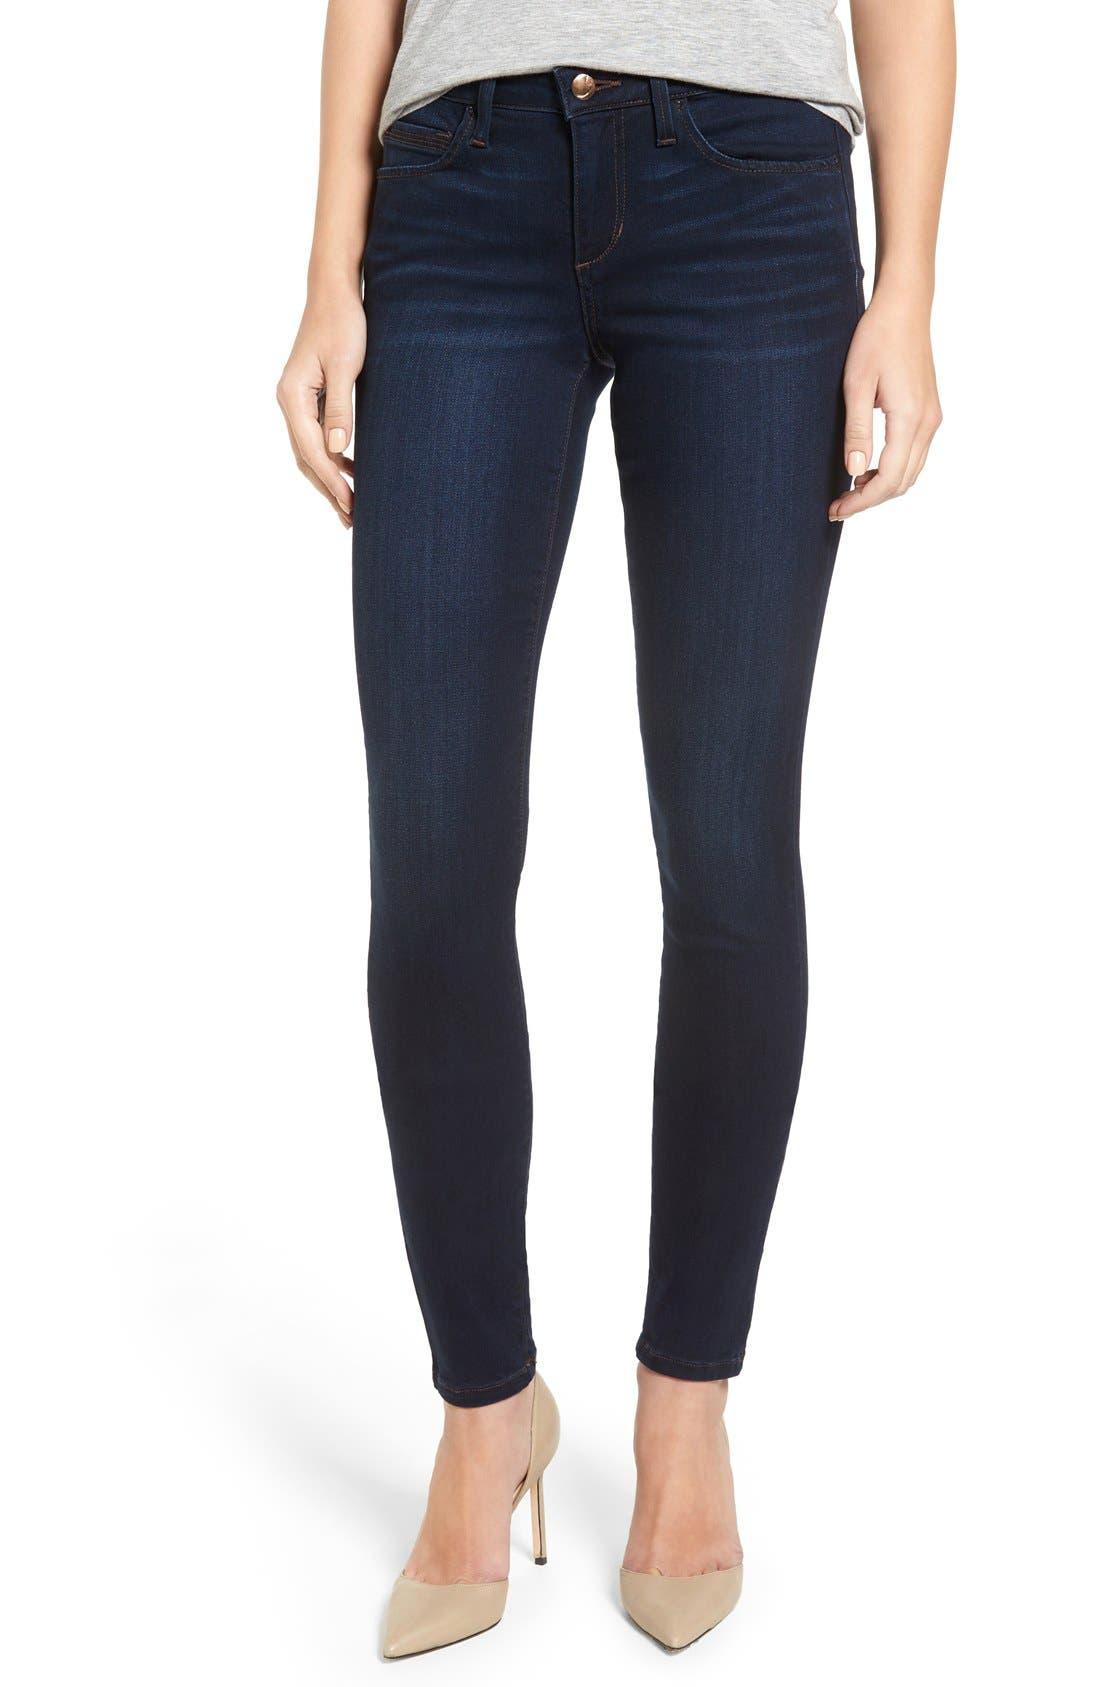 Alternate Image 1 Selected - Joe's 'Flawless - Honey' Curvy Skinny Jeans (Selma)